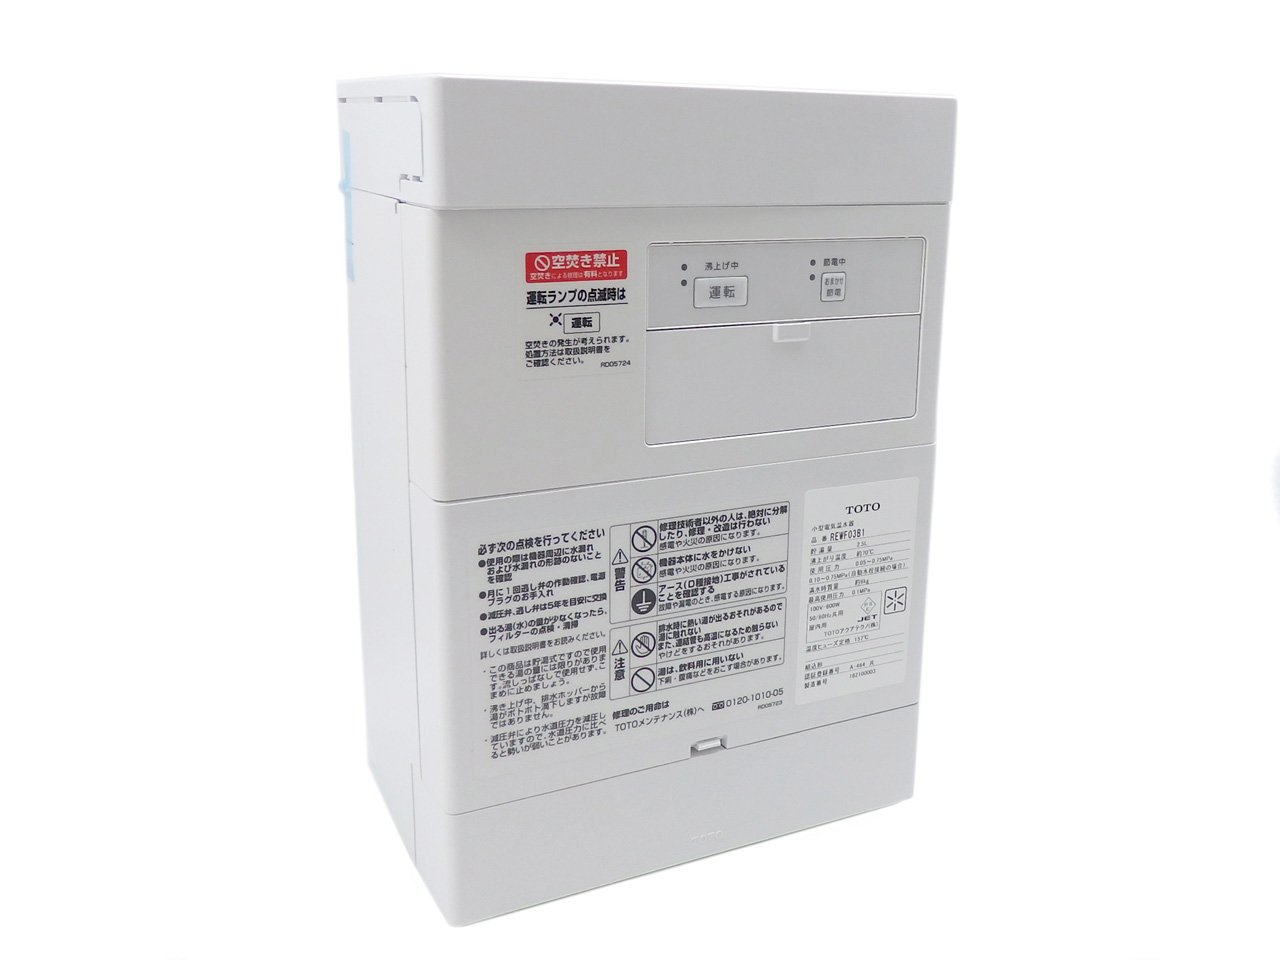 TOTO 小型電気温水器 REWF03B1 B07BTB3YZ6